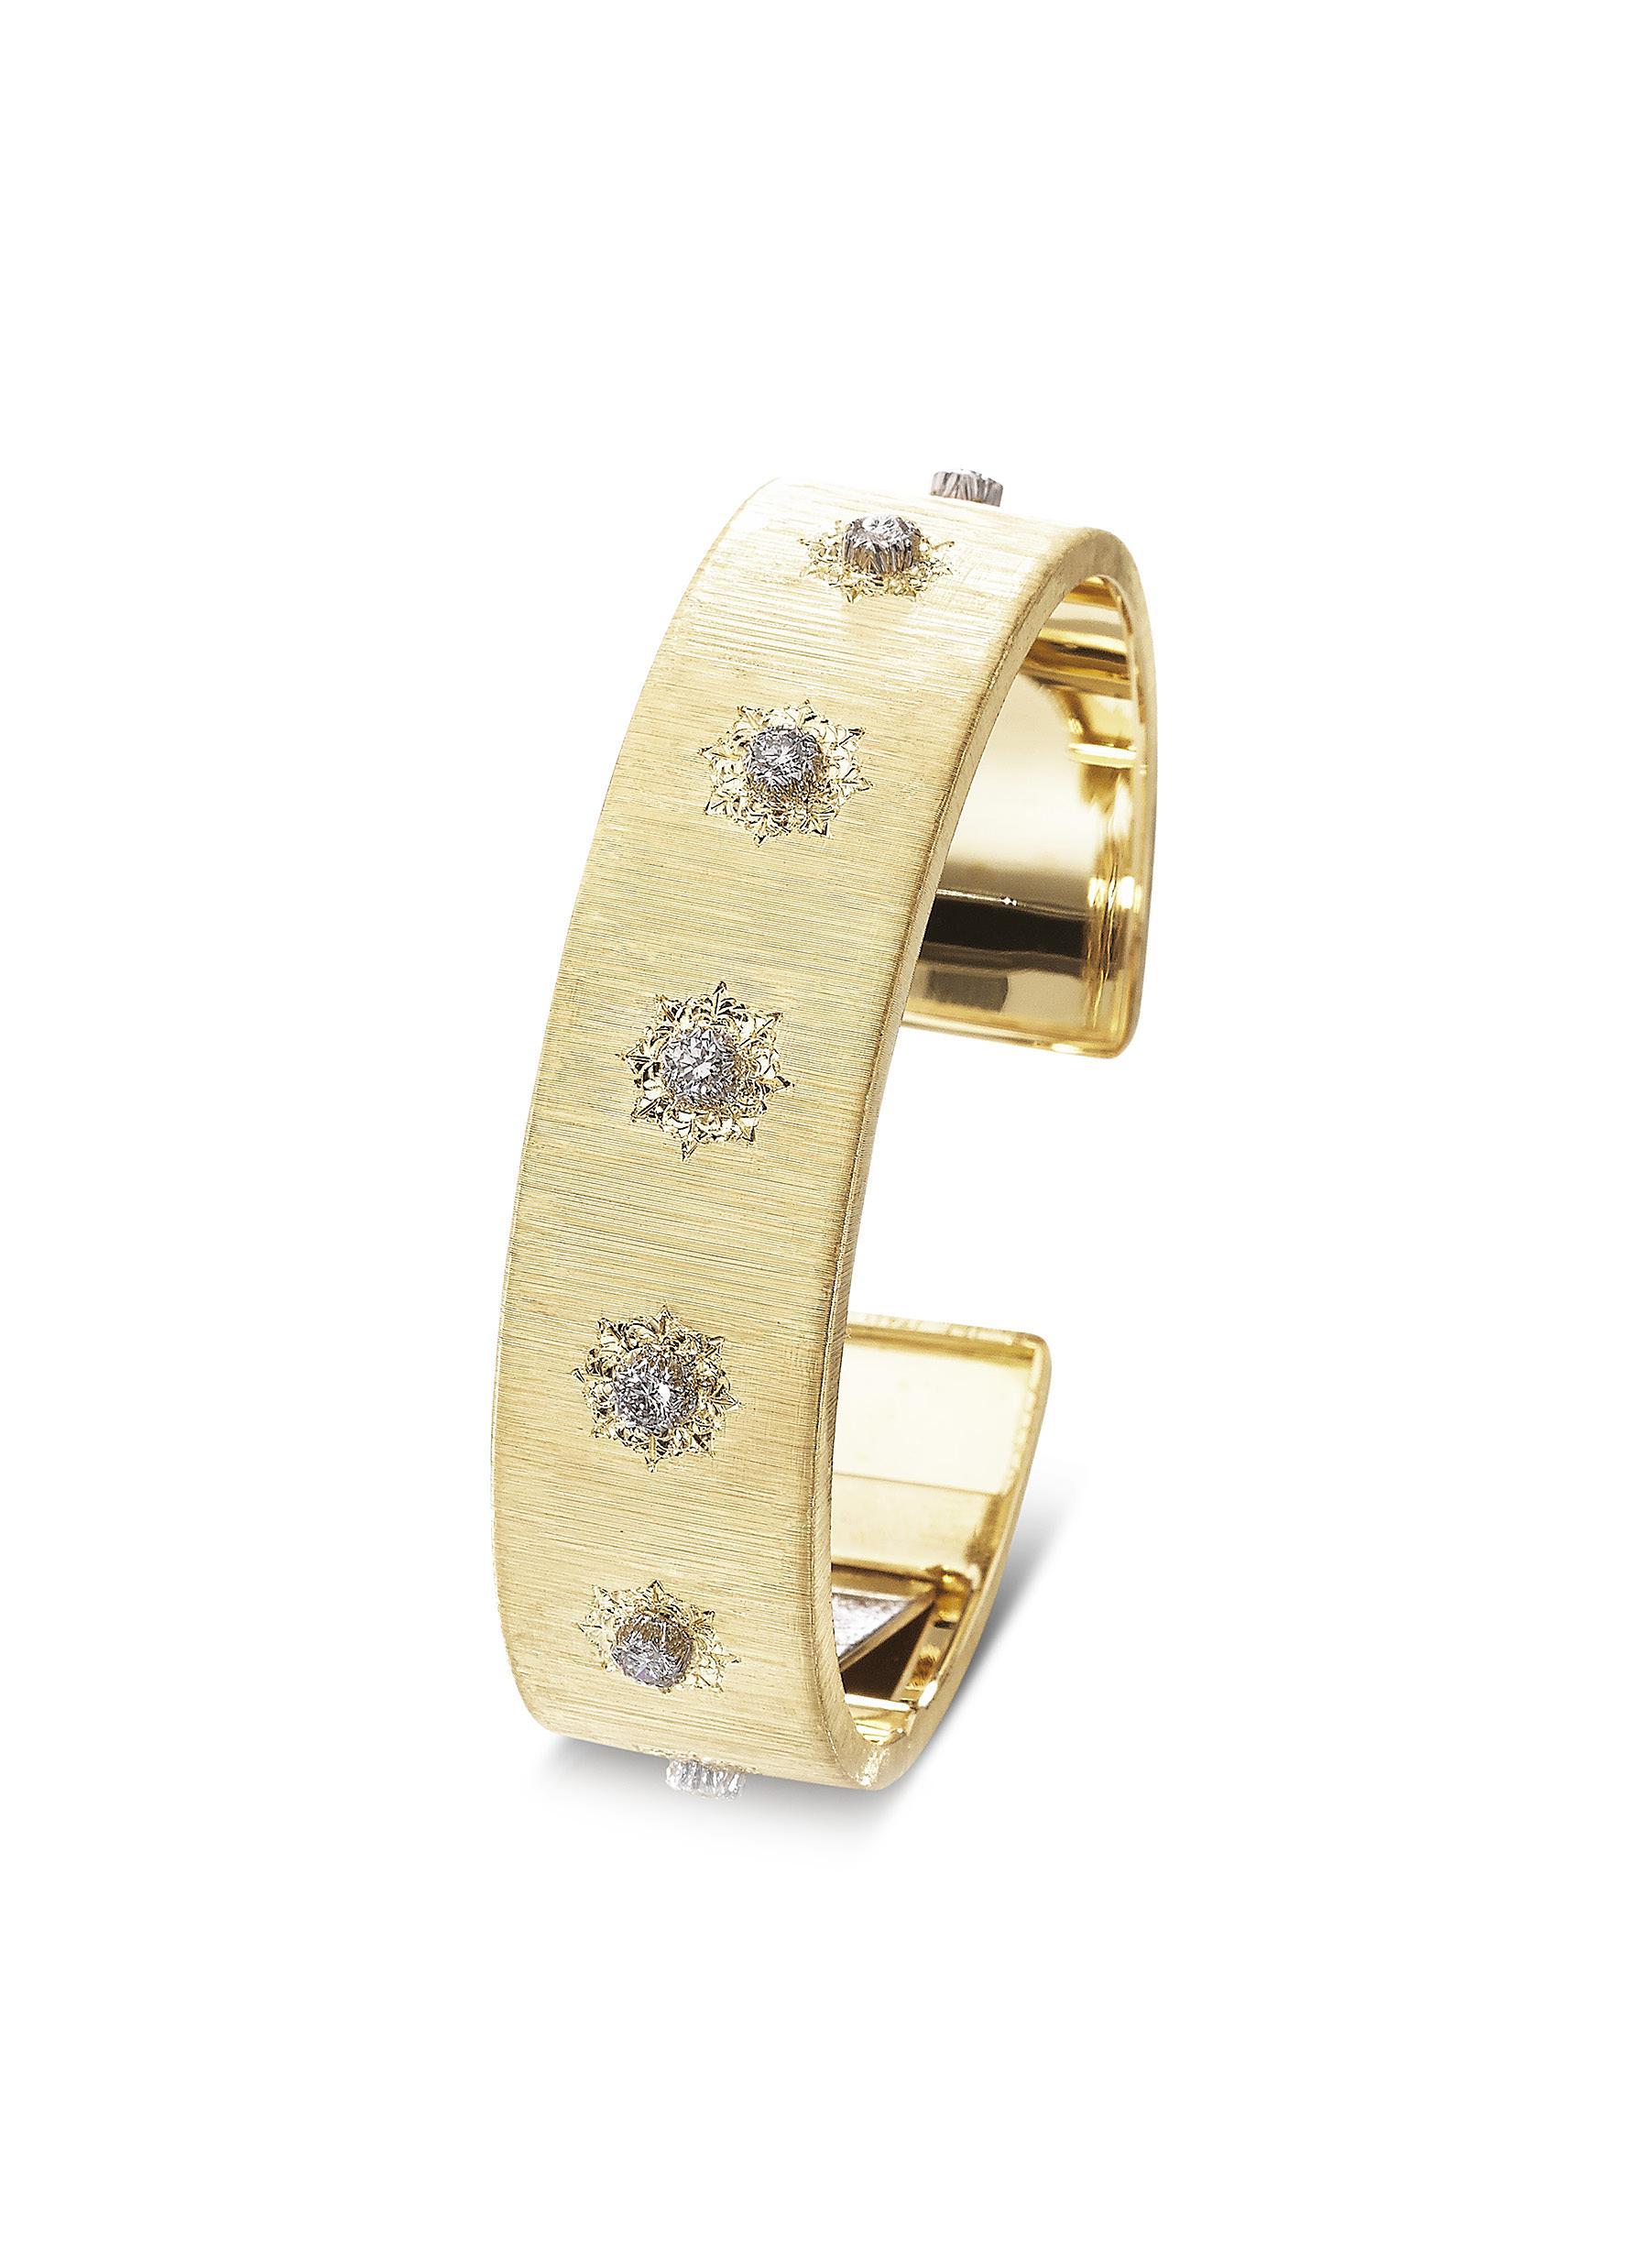 'Macri' diamond yellow gold cuff